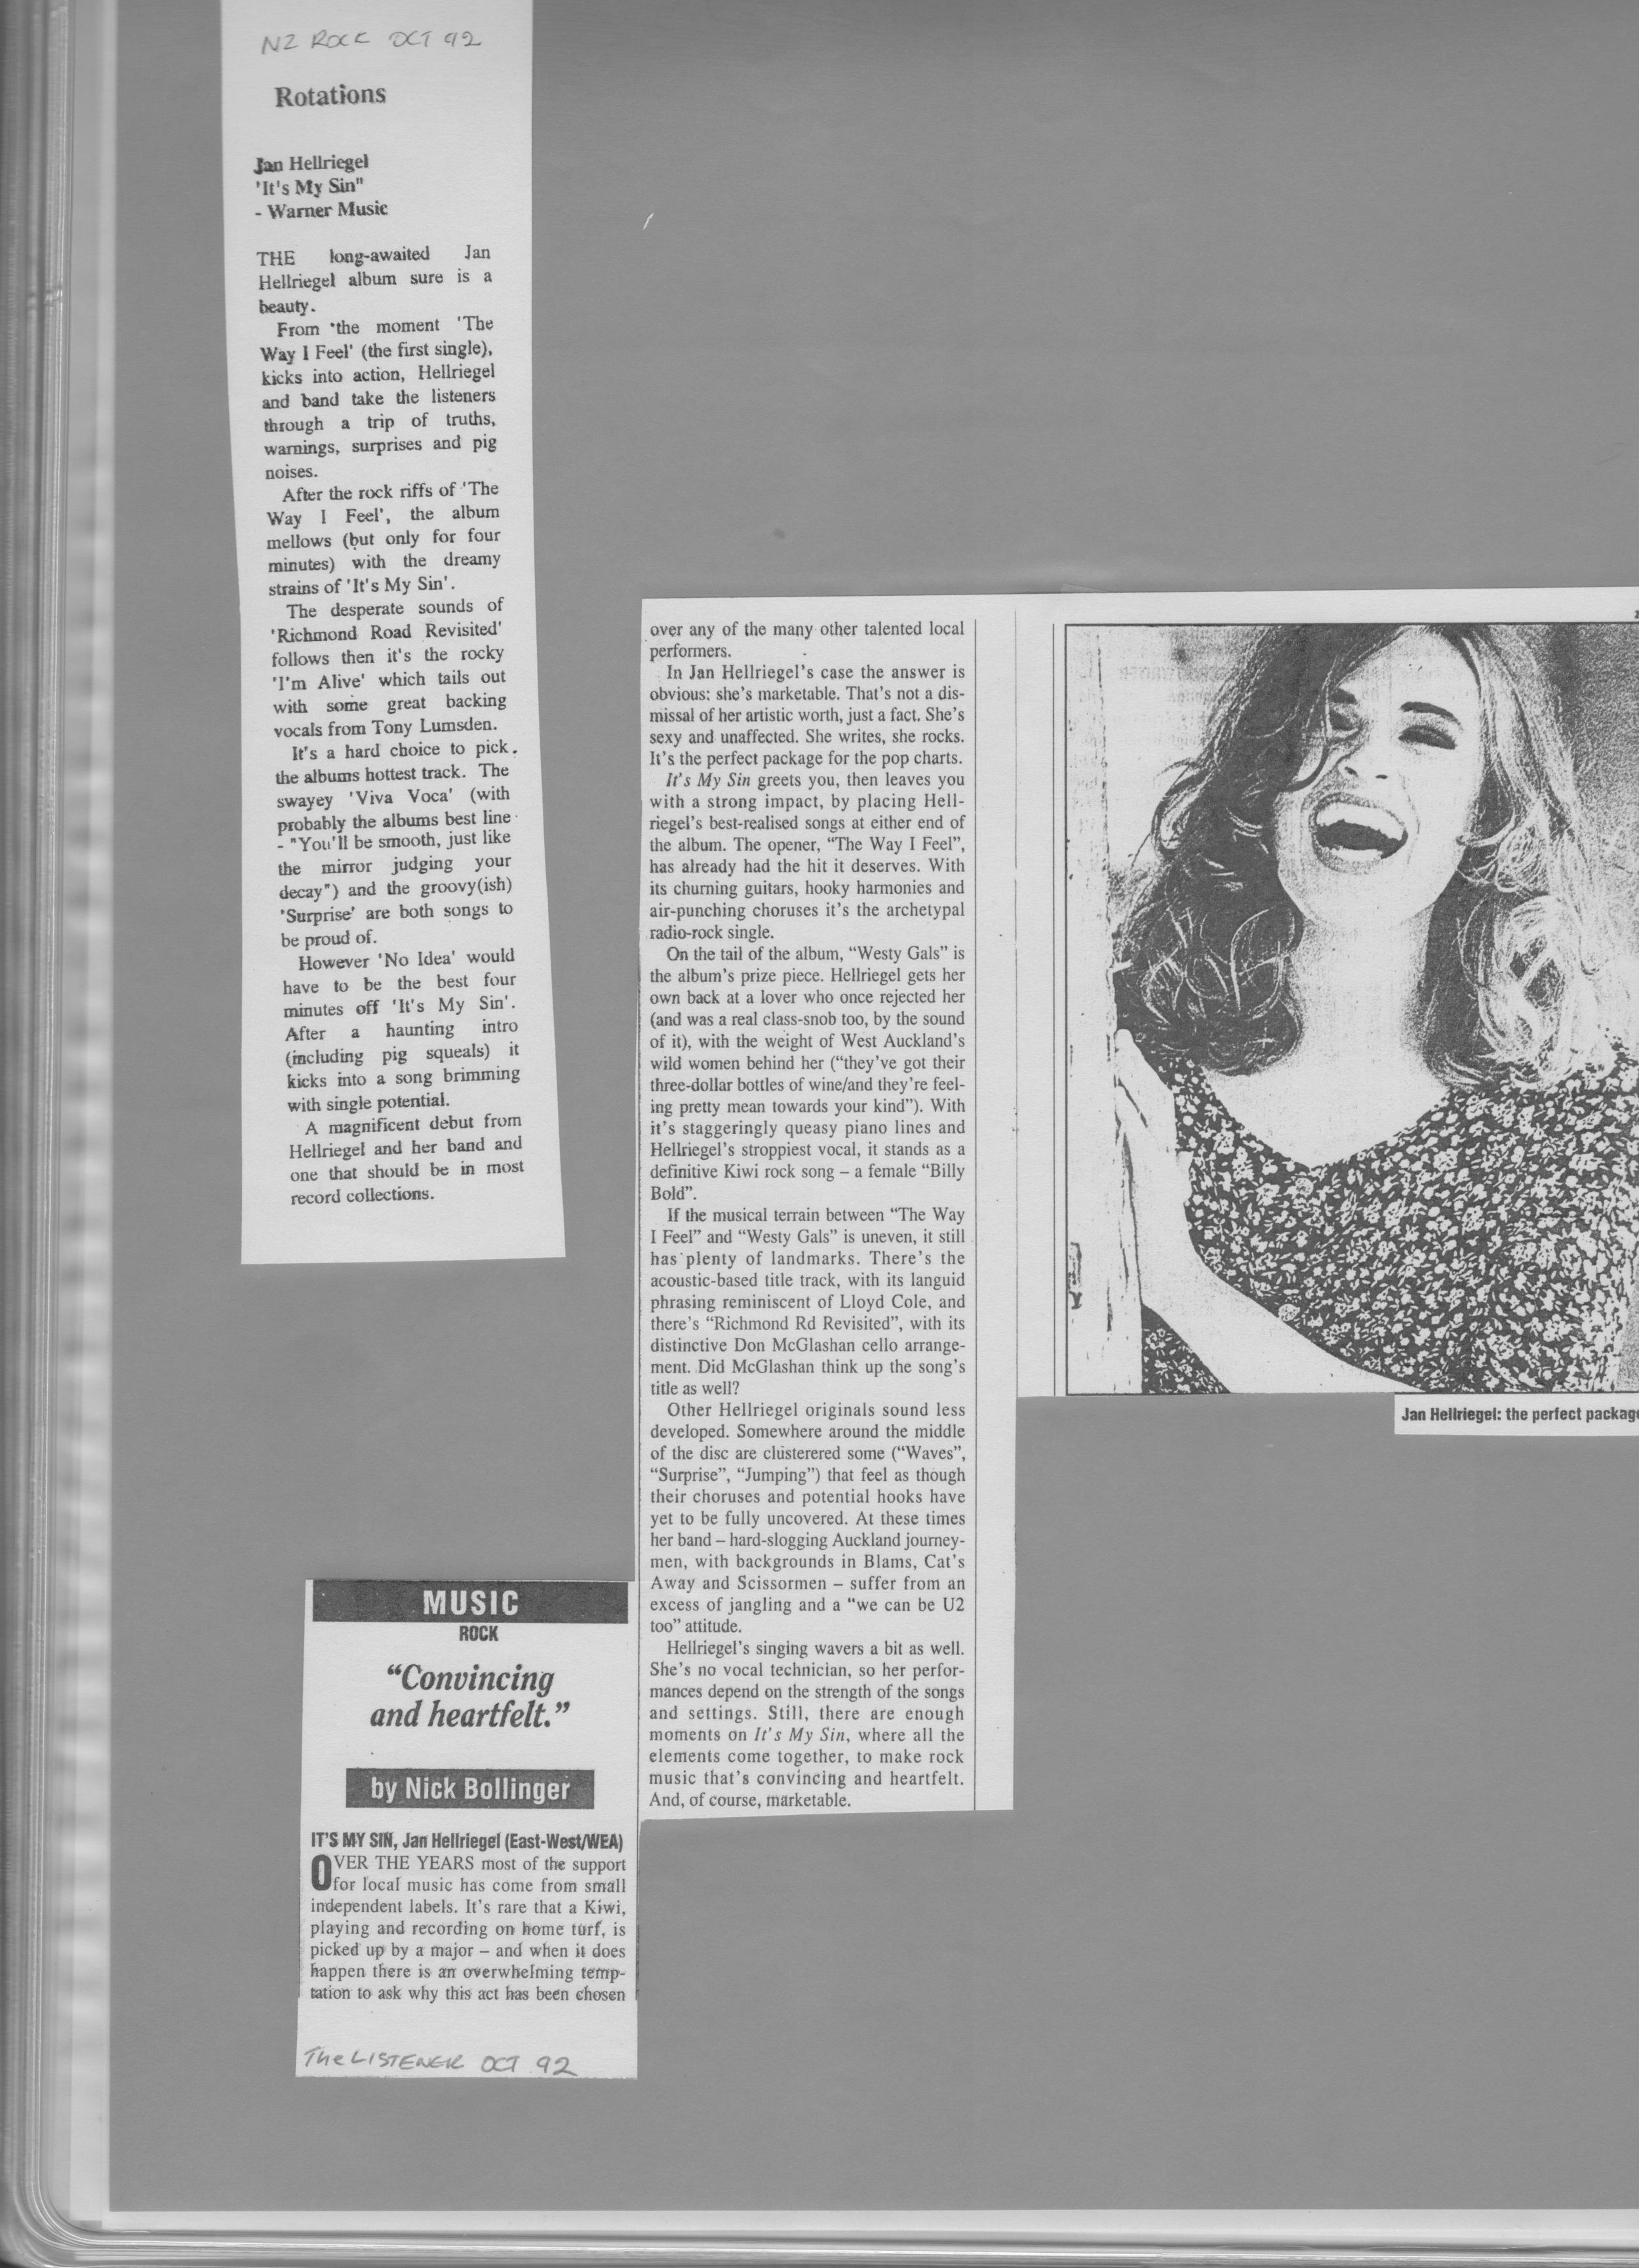 Listener Review - October 1992